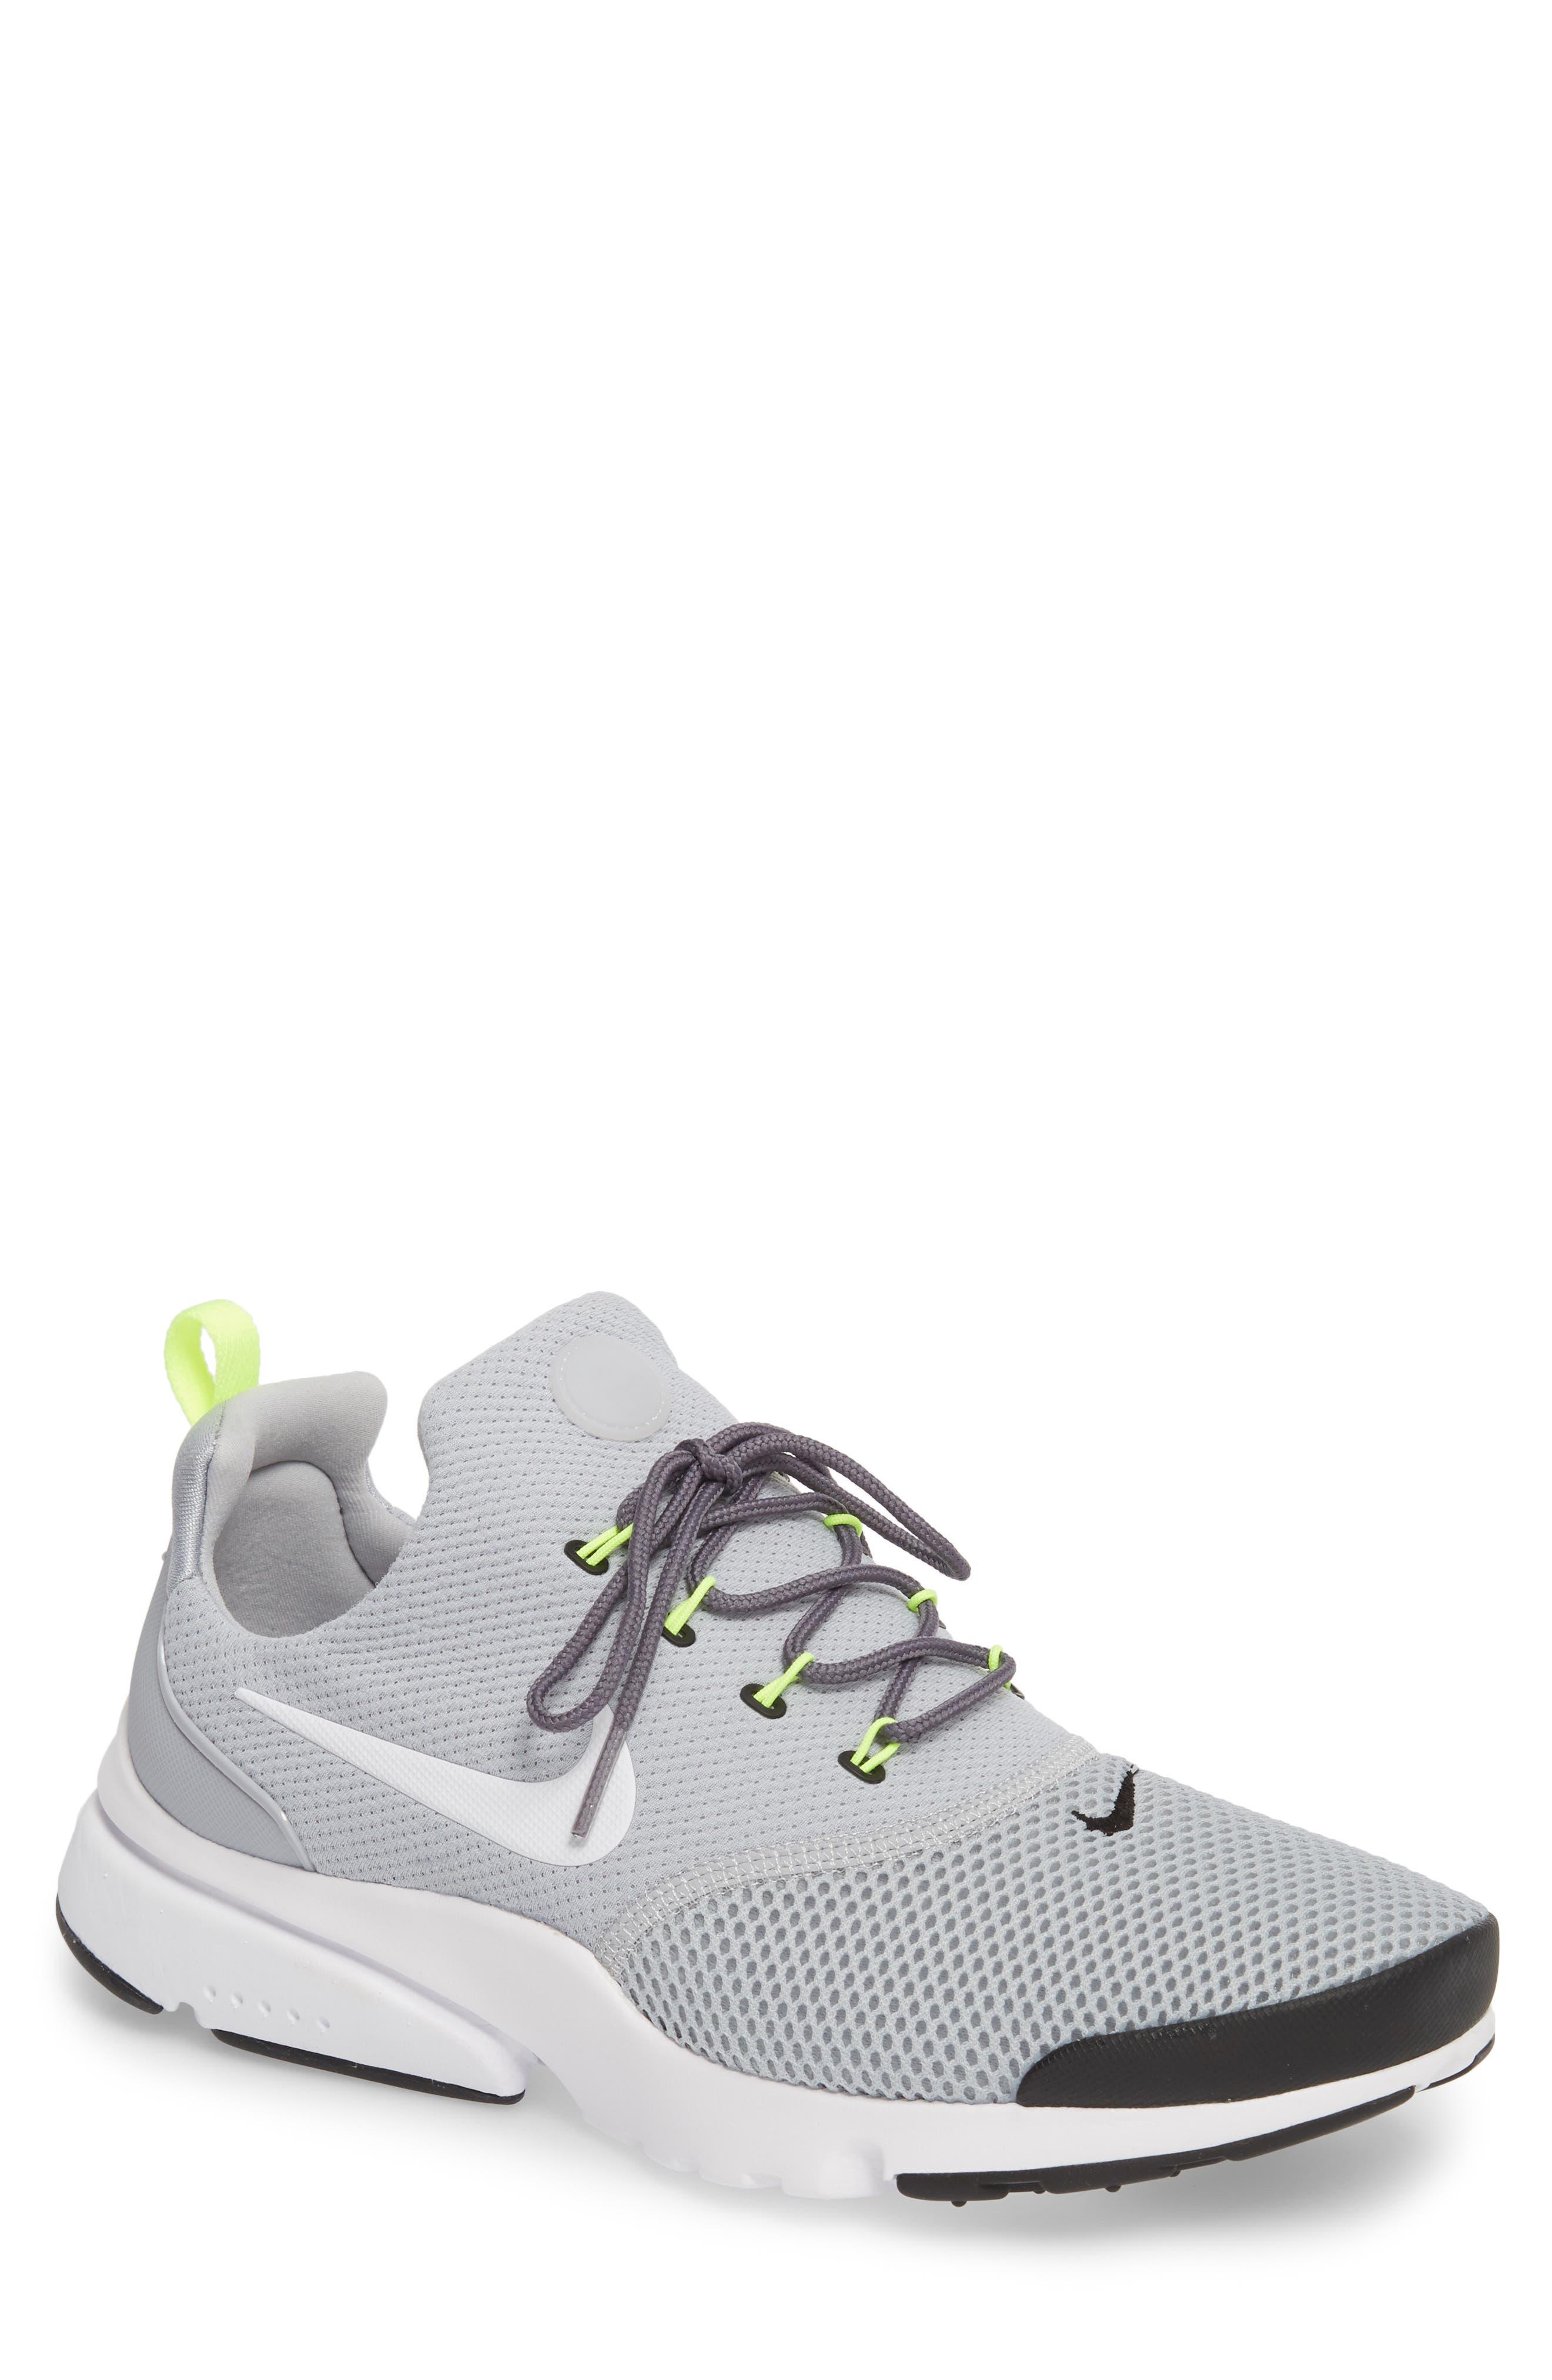 Presto Fly Sneaker,                         Main,                         color, 023